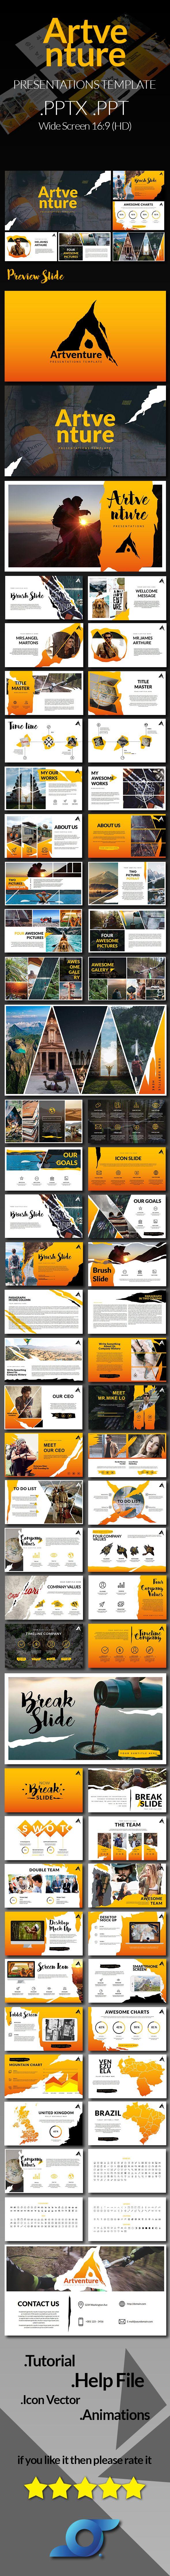 Artventure - PowerPoint Presentation Templates